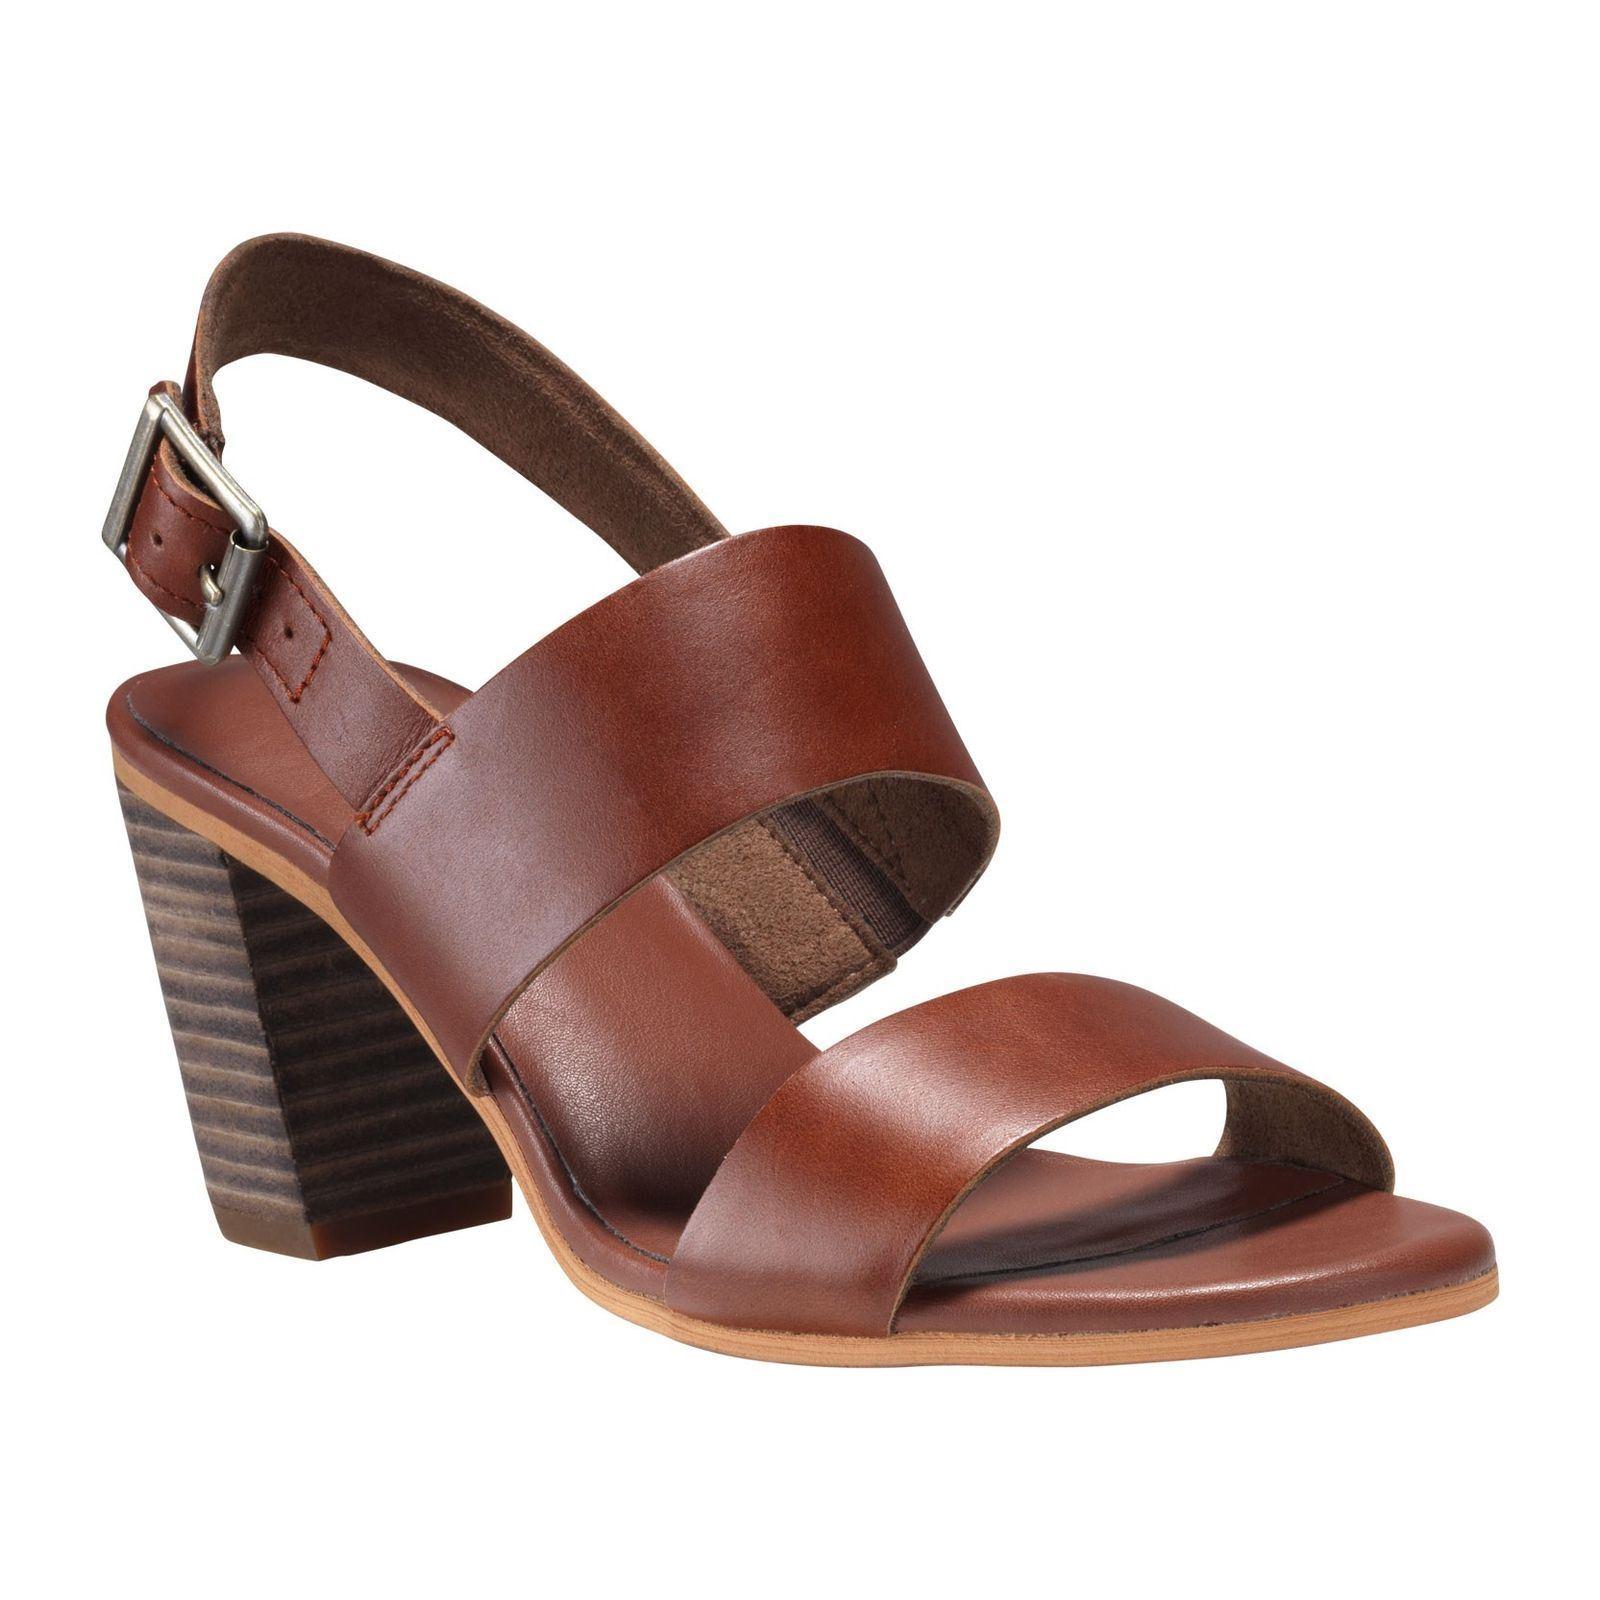 Sandale femme timberland